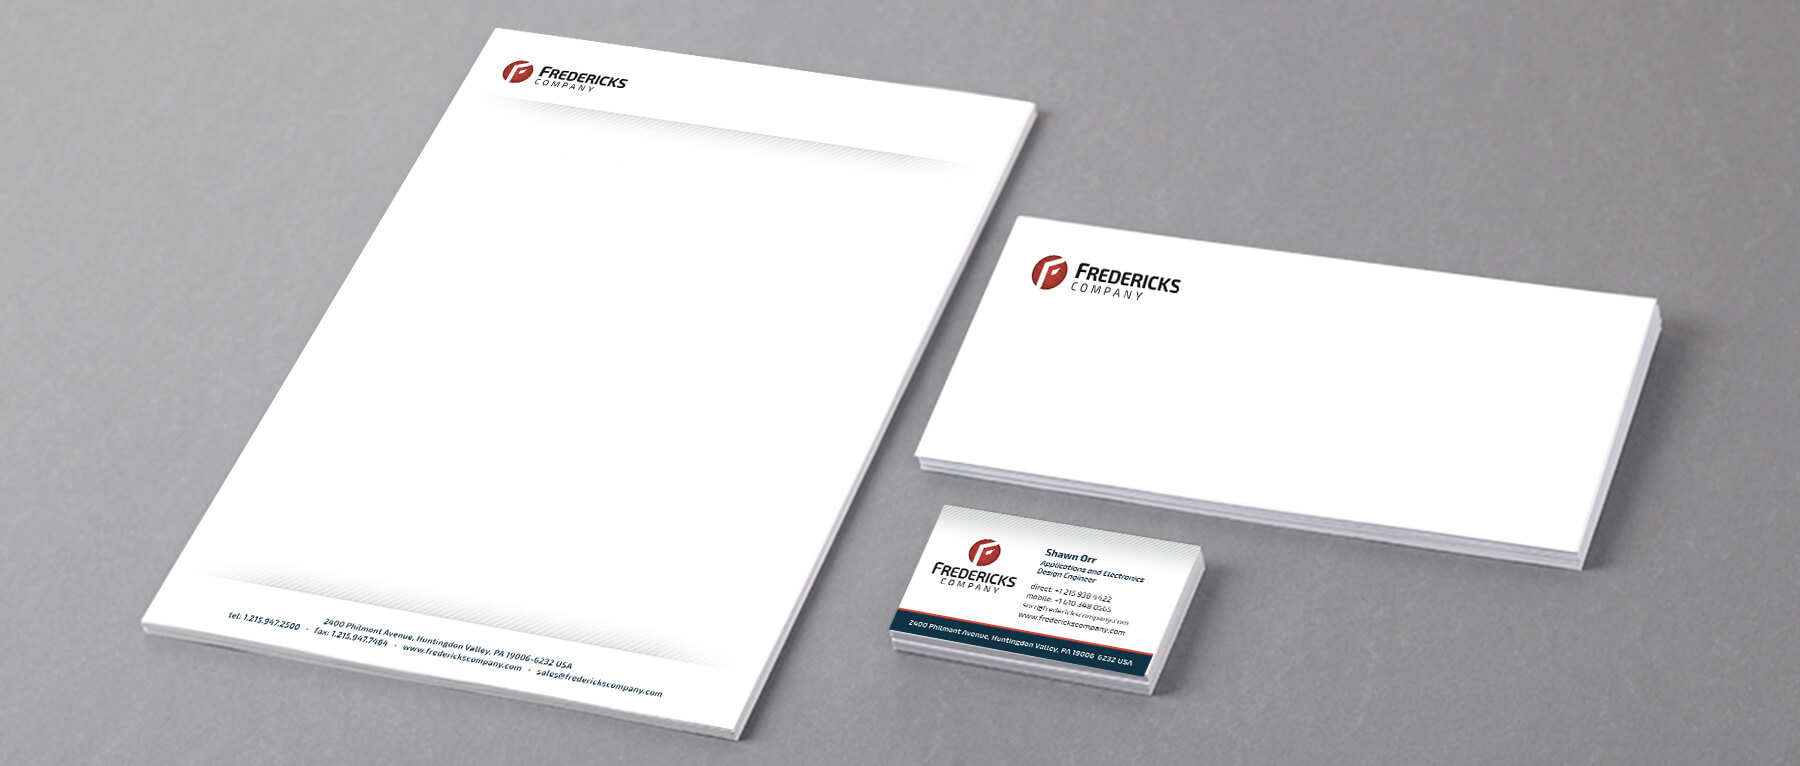 Fredericks Company B2B Brand Identity